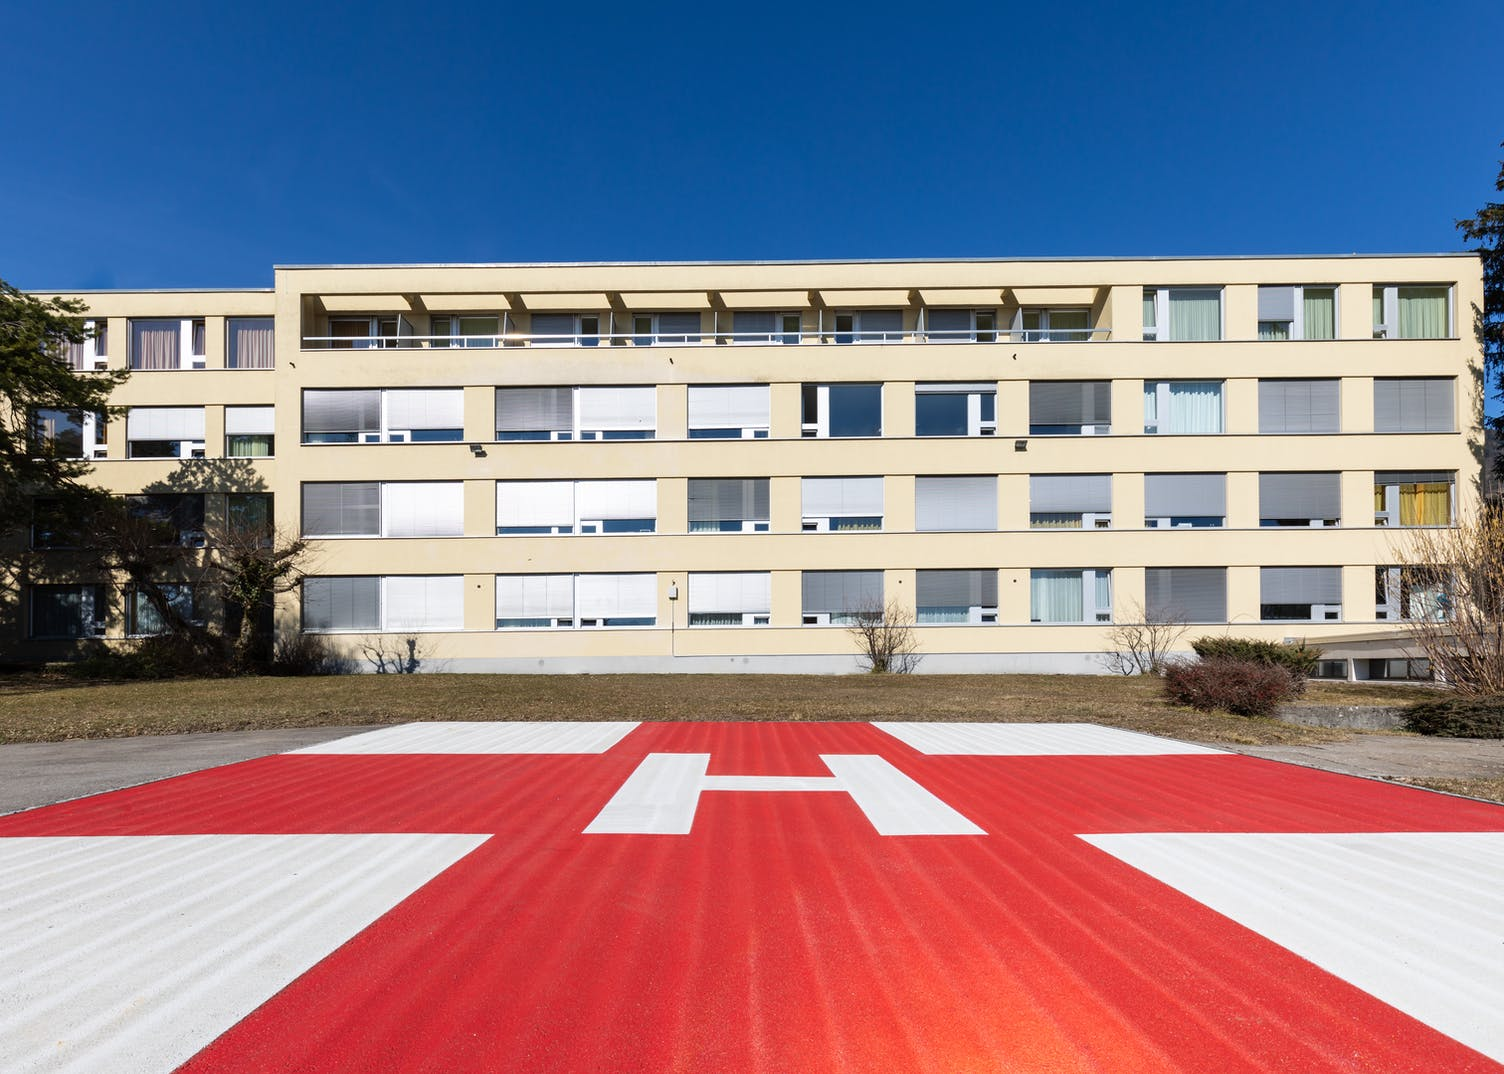 Spital Altstätten